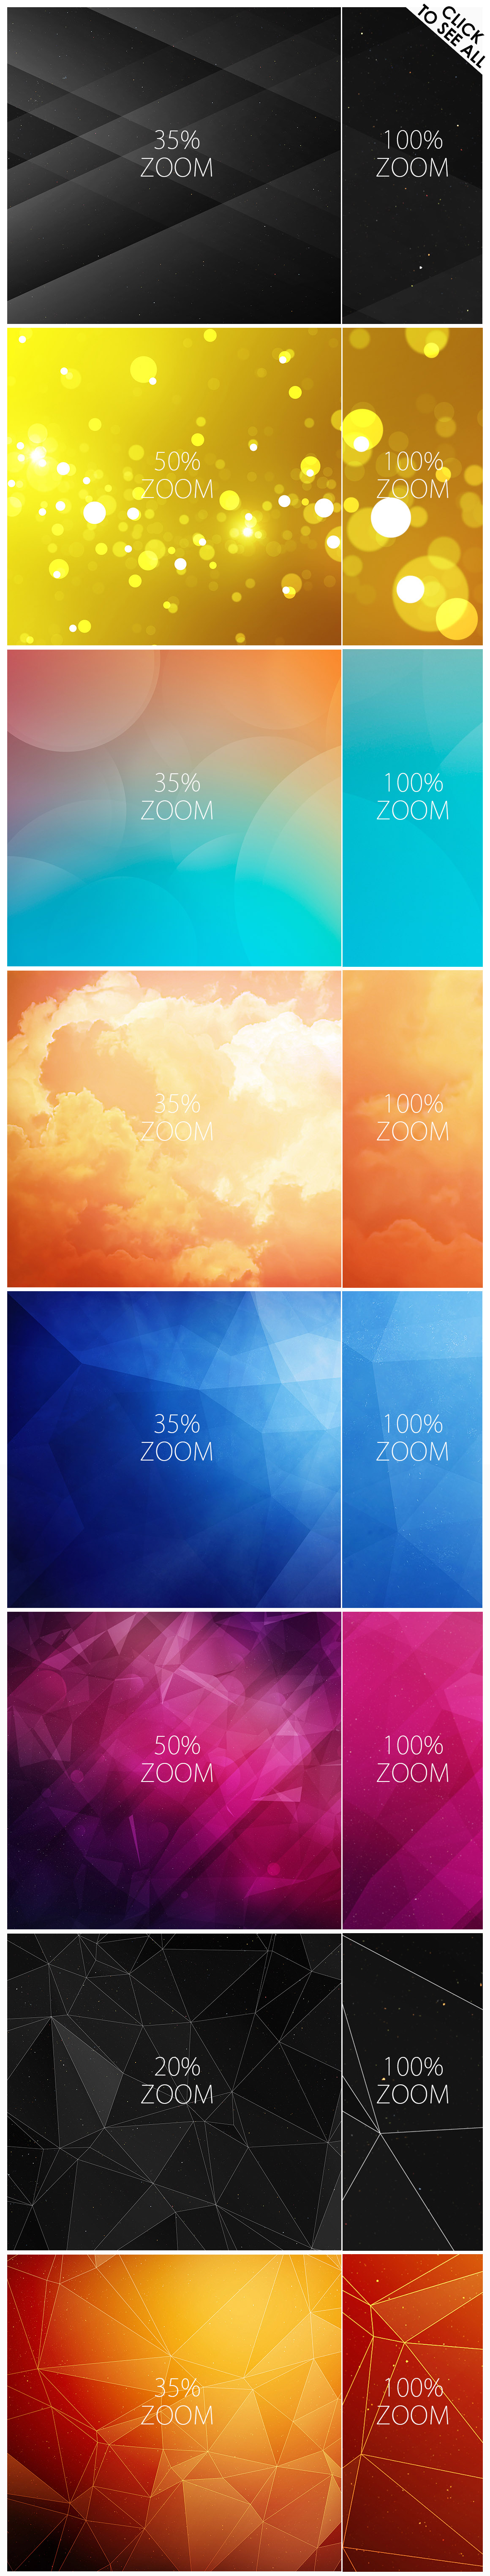 Supermassive Backgrounds Bundle example image 8